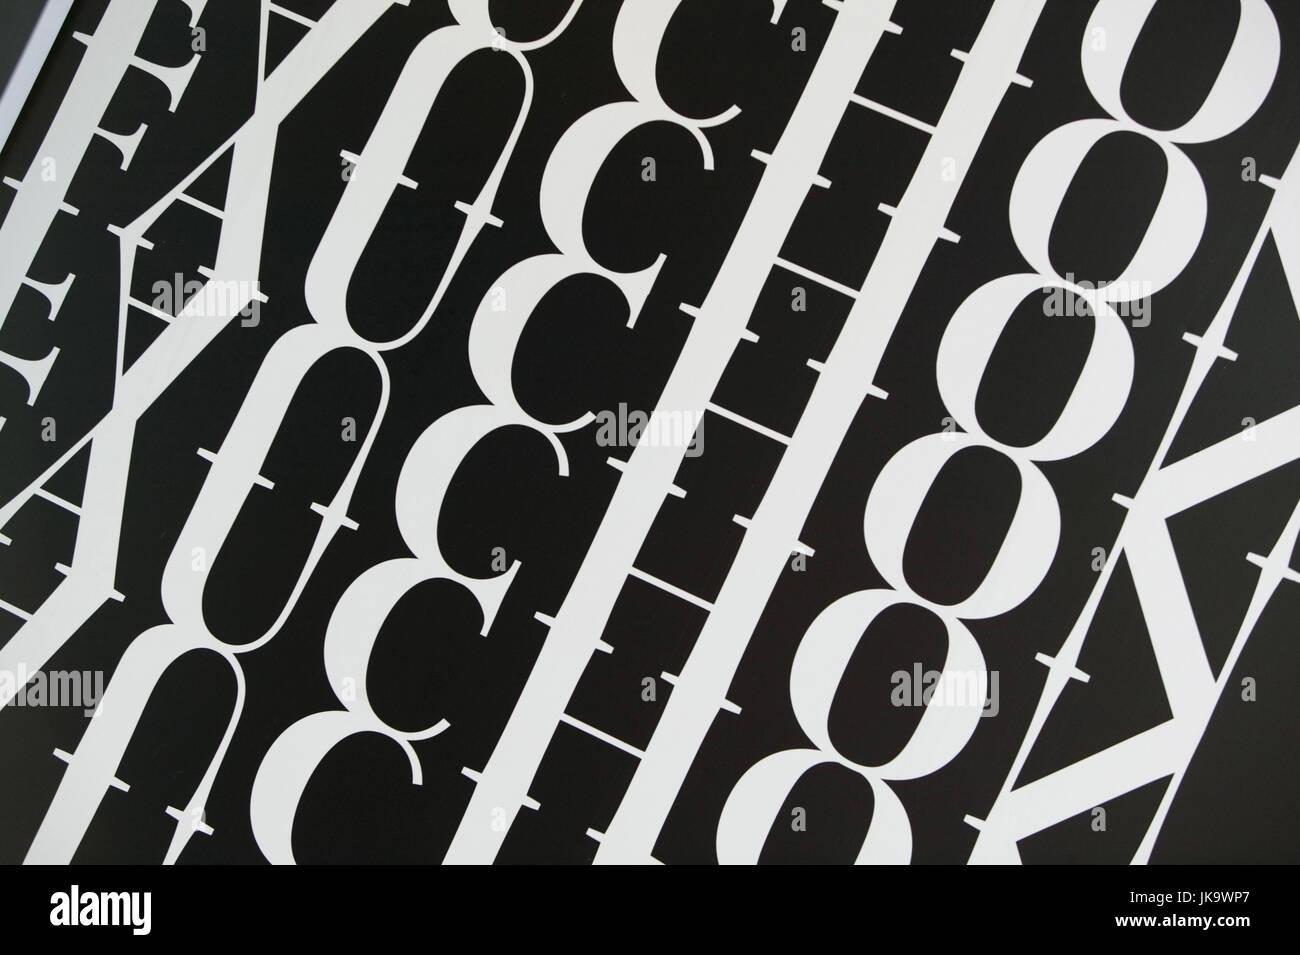 Frankreich, Schriftzug, 'Fauchon', close-up,  s/w, no property release,   Stadt, Hauptstadt, Delikatessenladen, - Stock Image